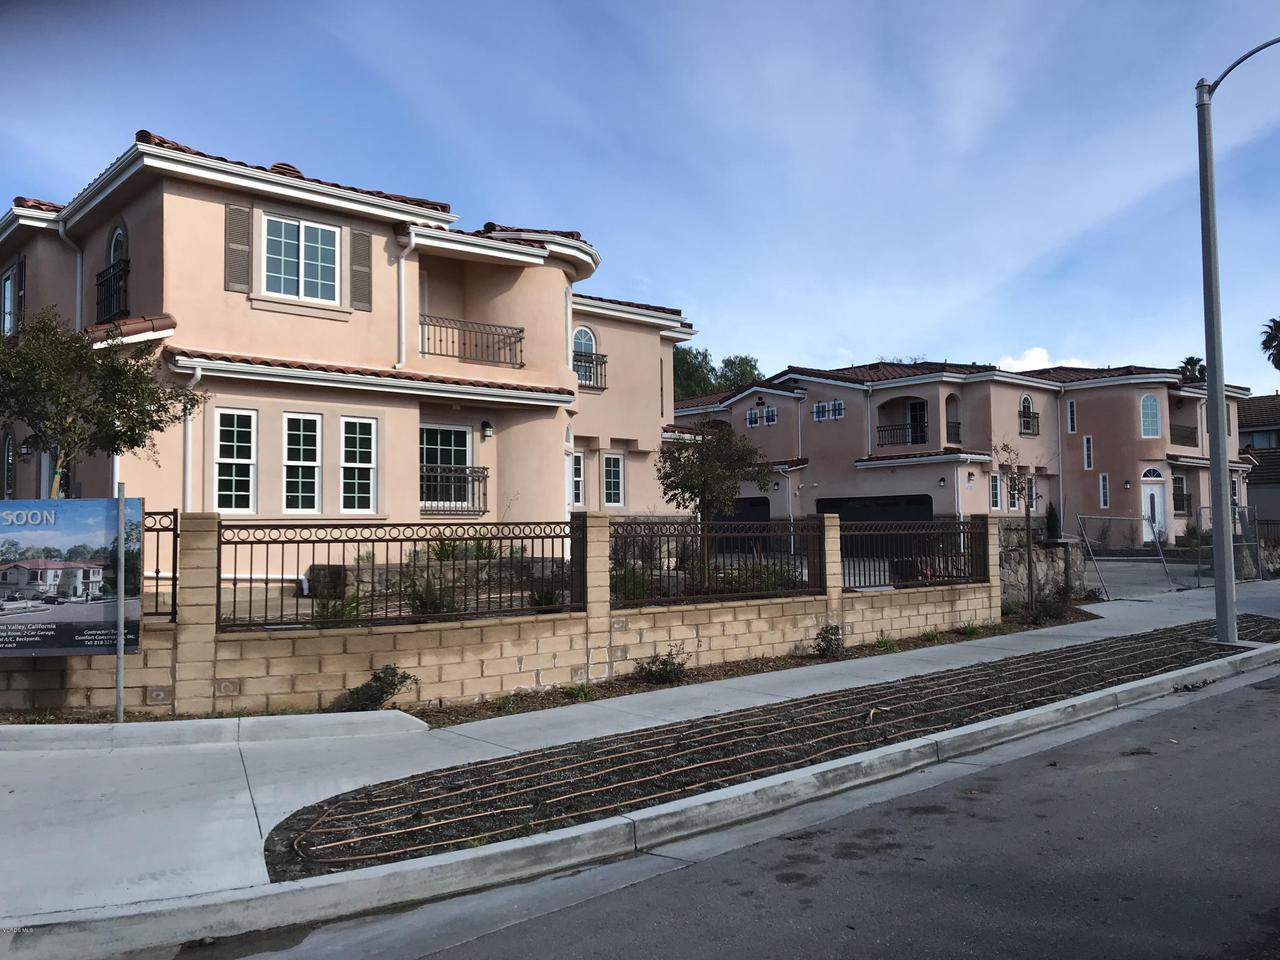 1731 PATRICIA, Simi Valley, CA 93065 - Front